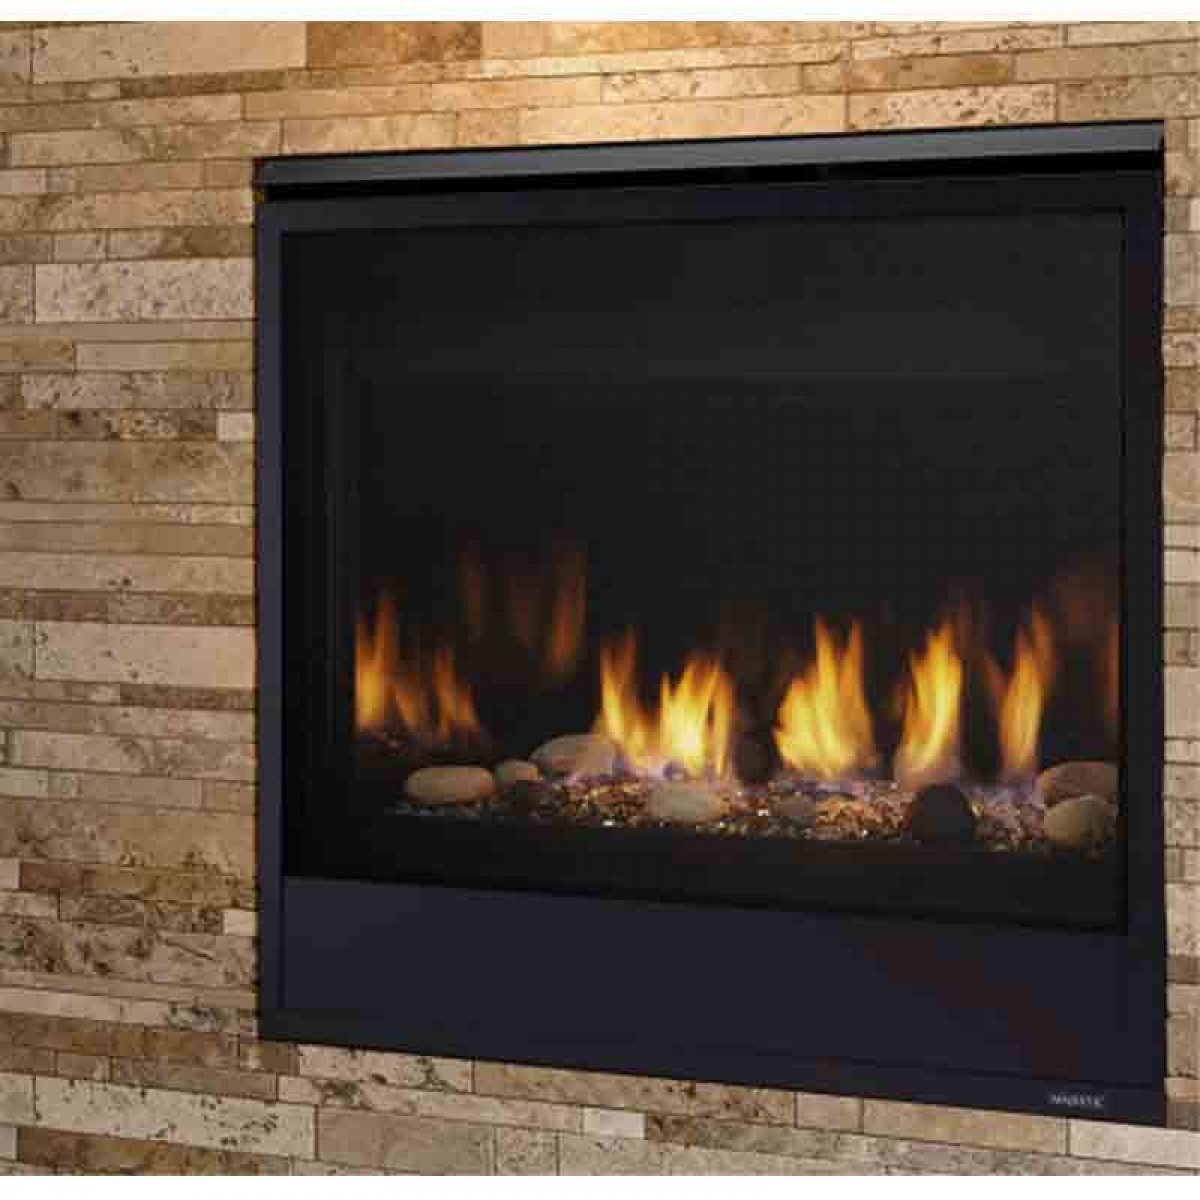 Majestic Quartz Direct Vent Fireplace